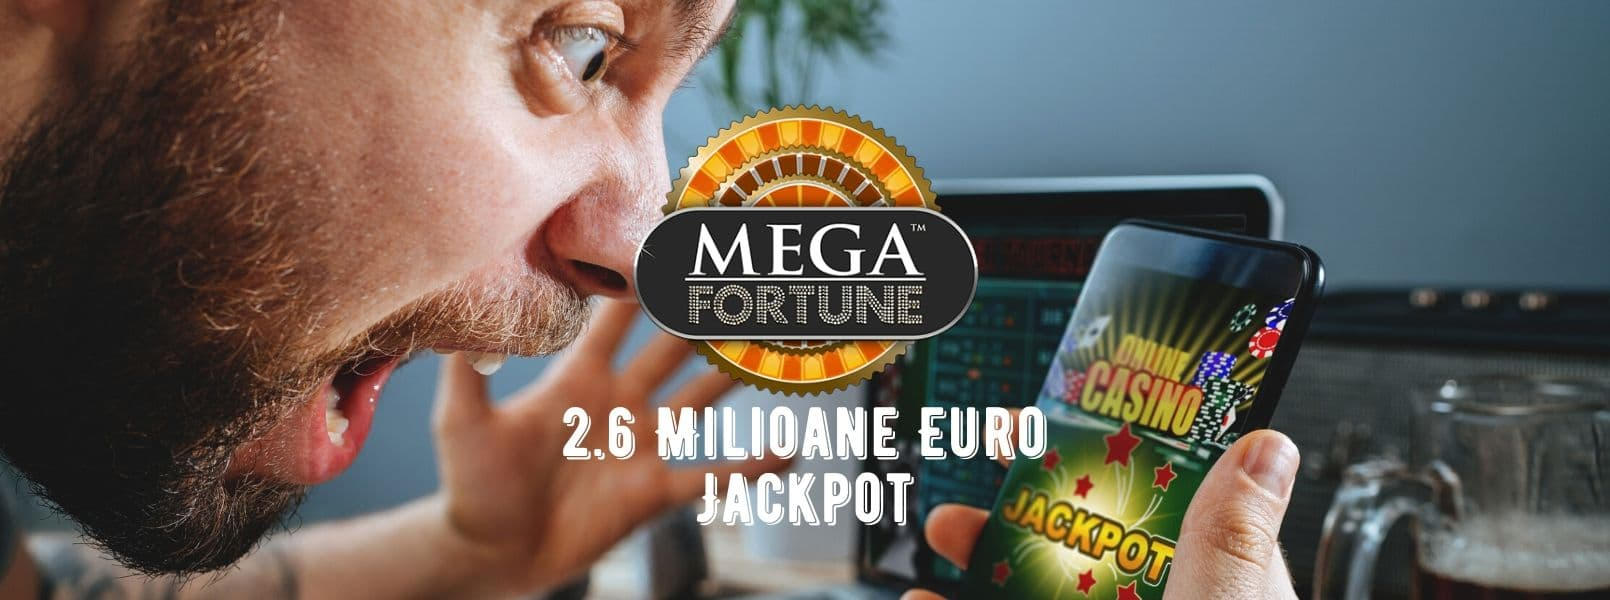 jackpot mega fortune